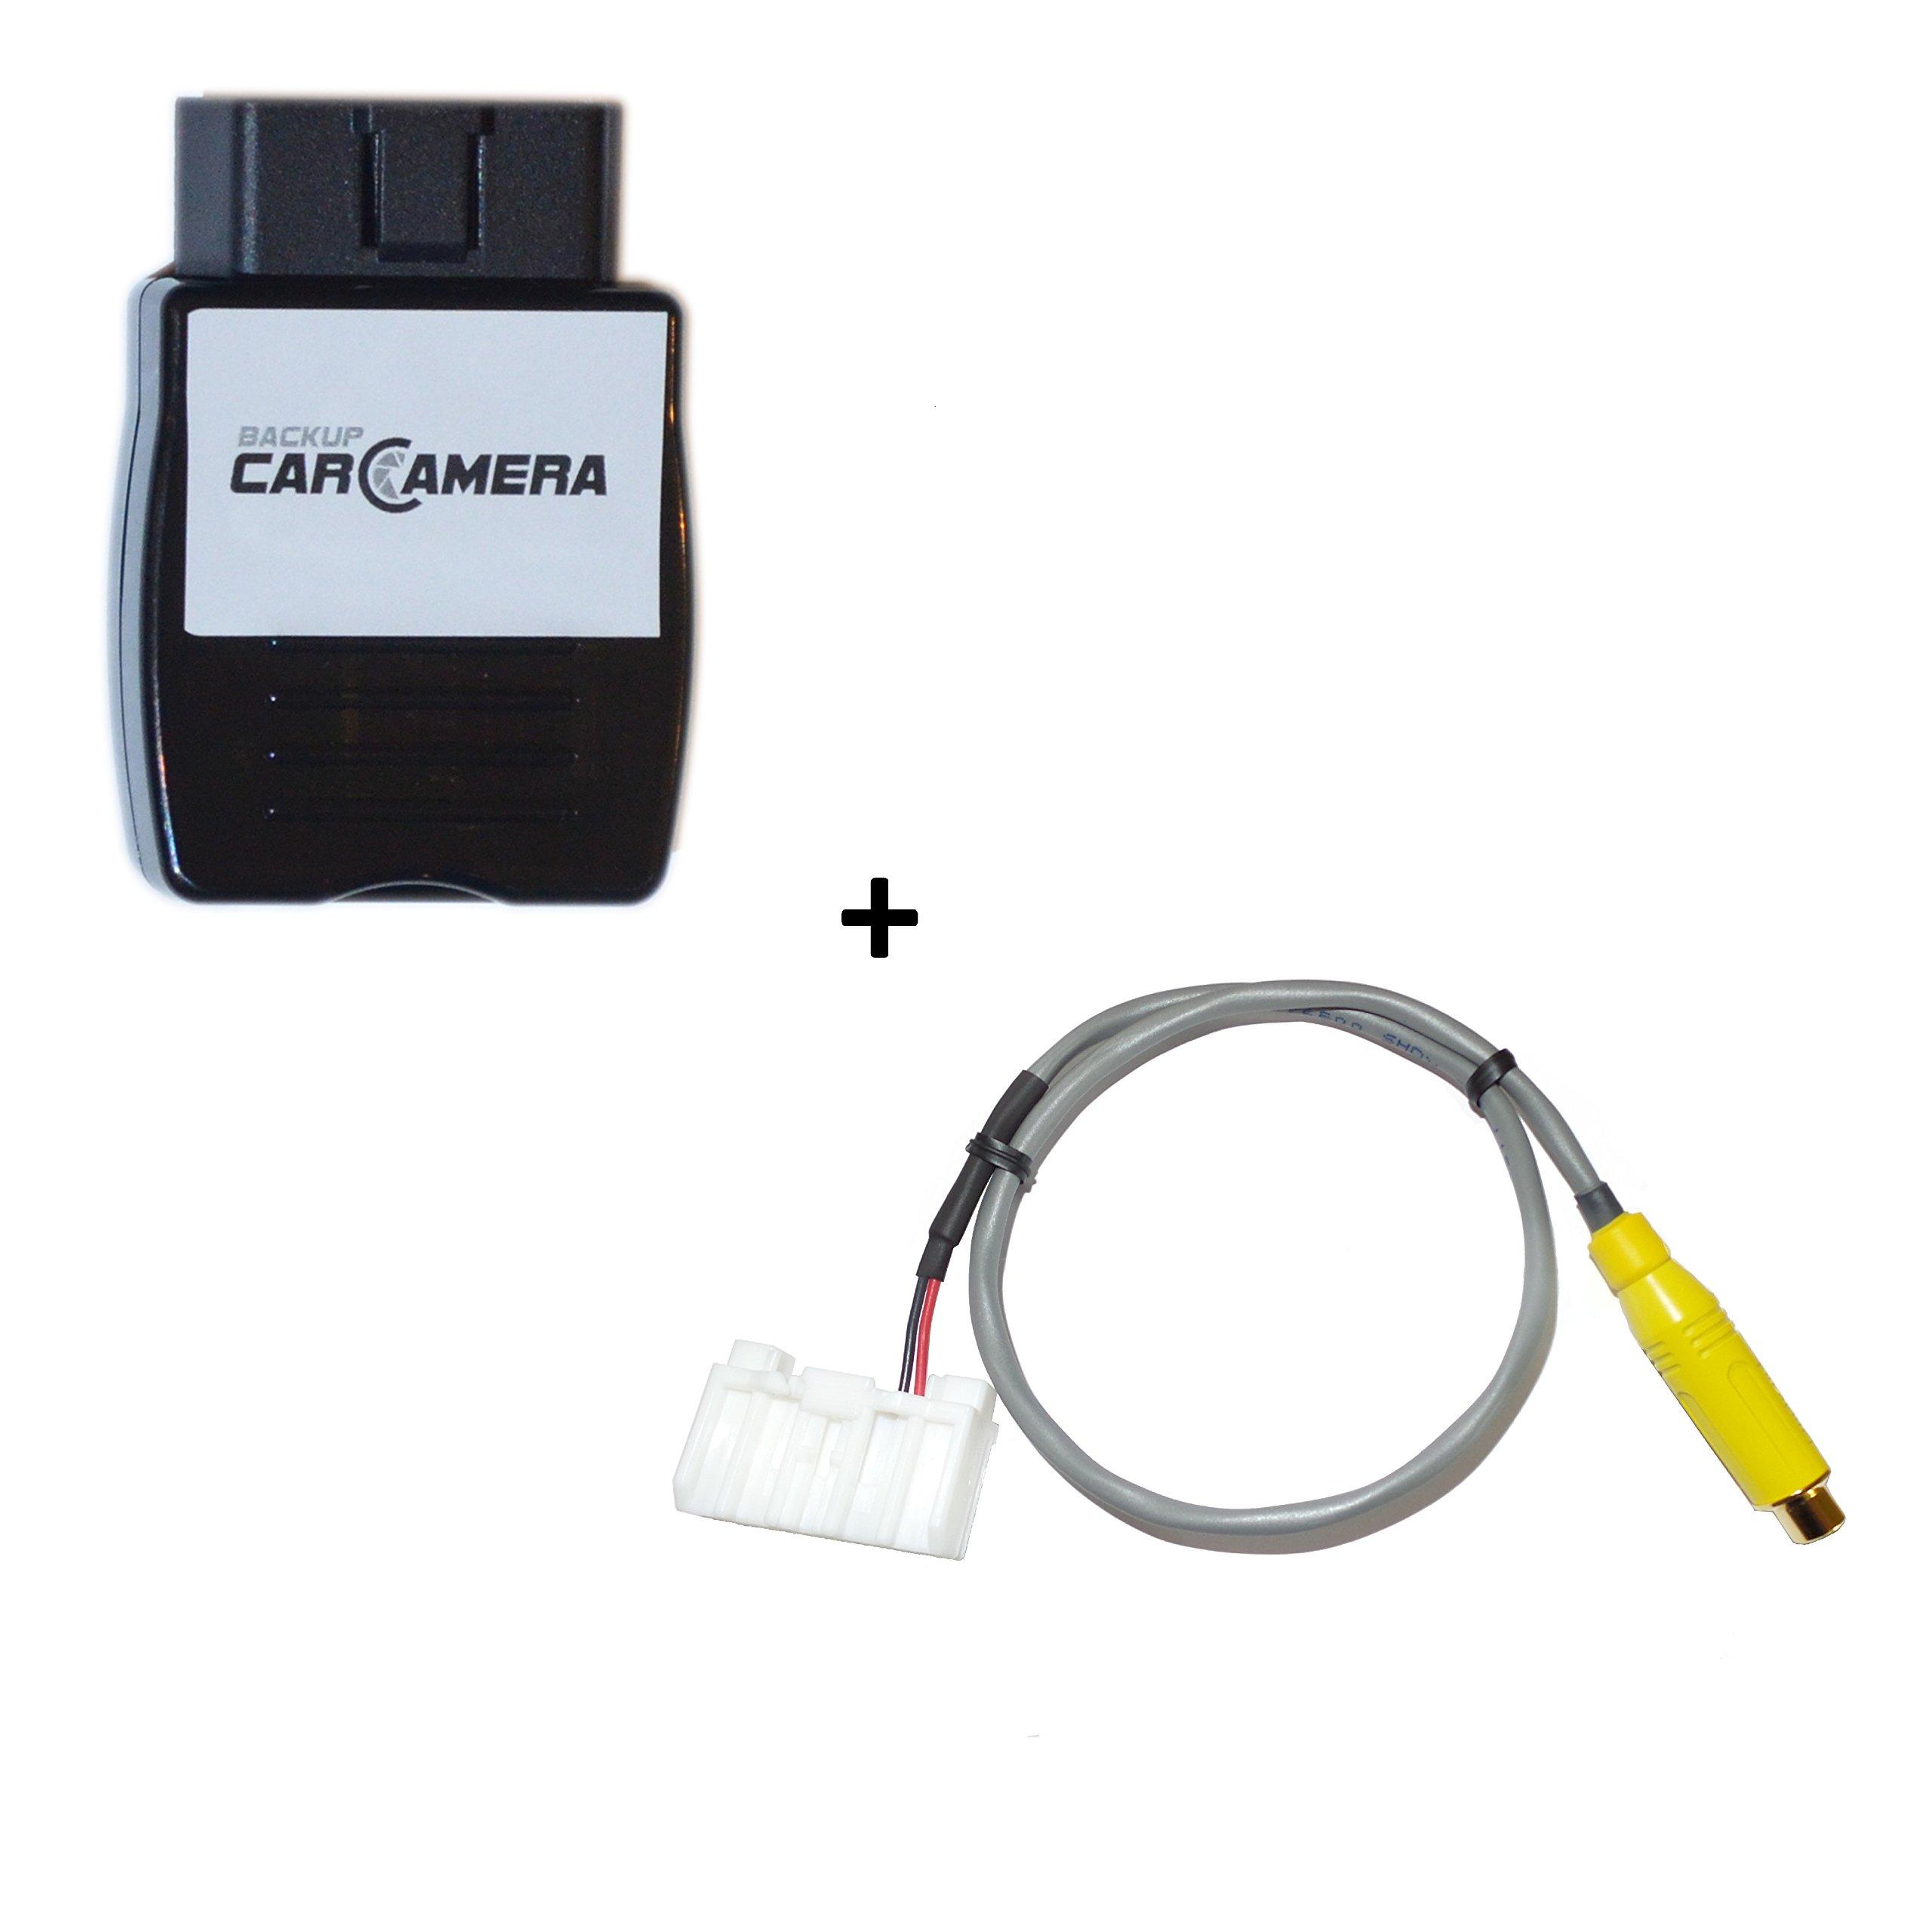 Jeep Wrangler JK Backup Camera OEM Radio Interface Kit, Video Harness & Programmer for MyGIG Factory Radios (RB2 RBZ REN REW REP RER REZ RHB RHR RHW RHP) & All Models (Sport Sahara Rubicon Unlimited)